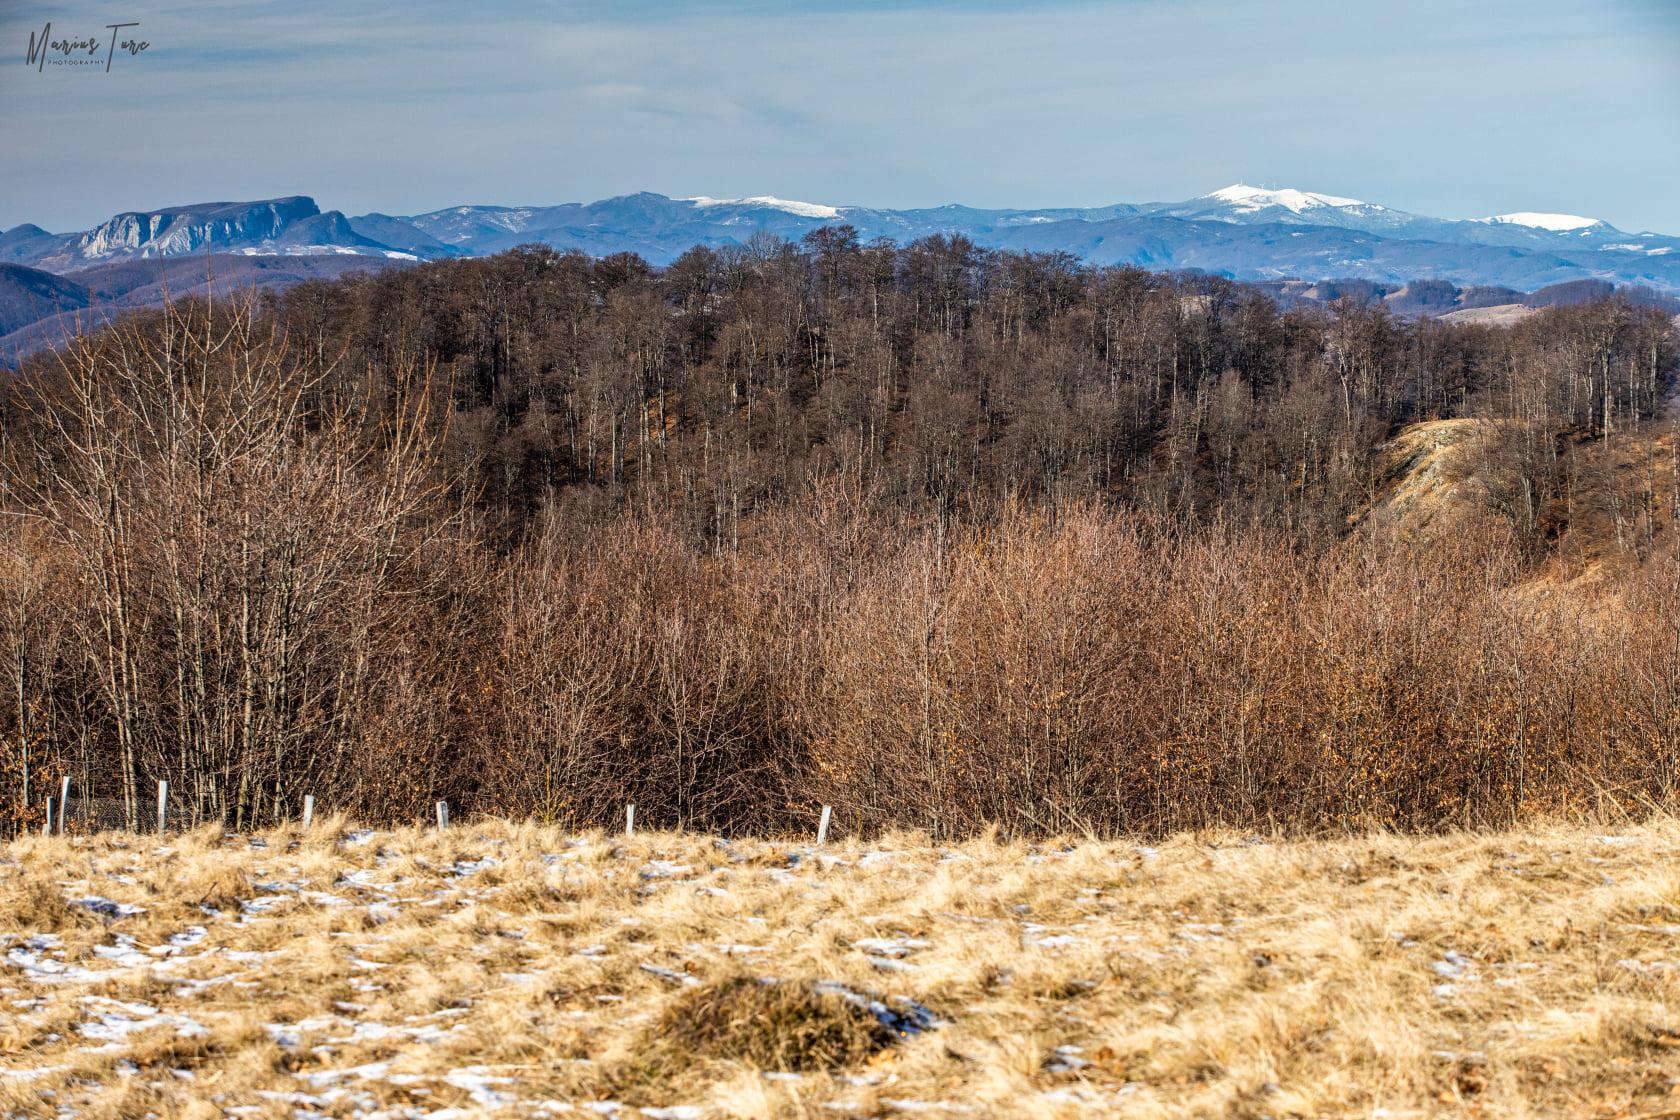 Panorama spre Muntele Vulcan,Gaina,Biharia si Piatra Graitoare - Marius Turc